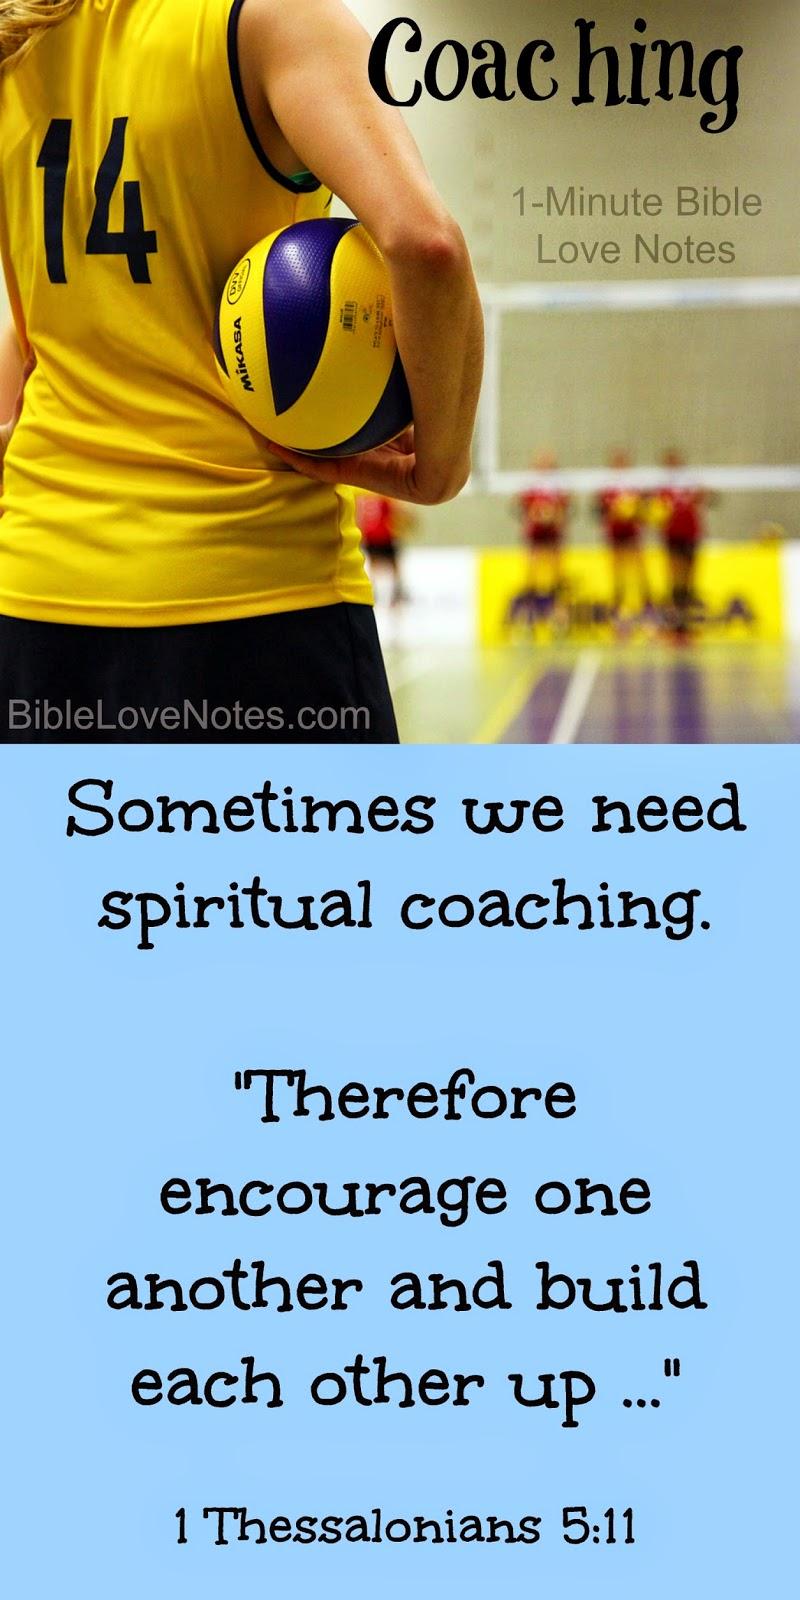 Discipleship, Coaching Christians